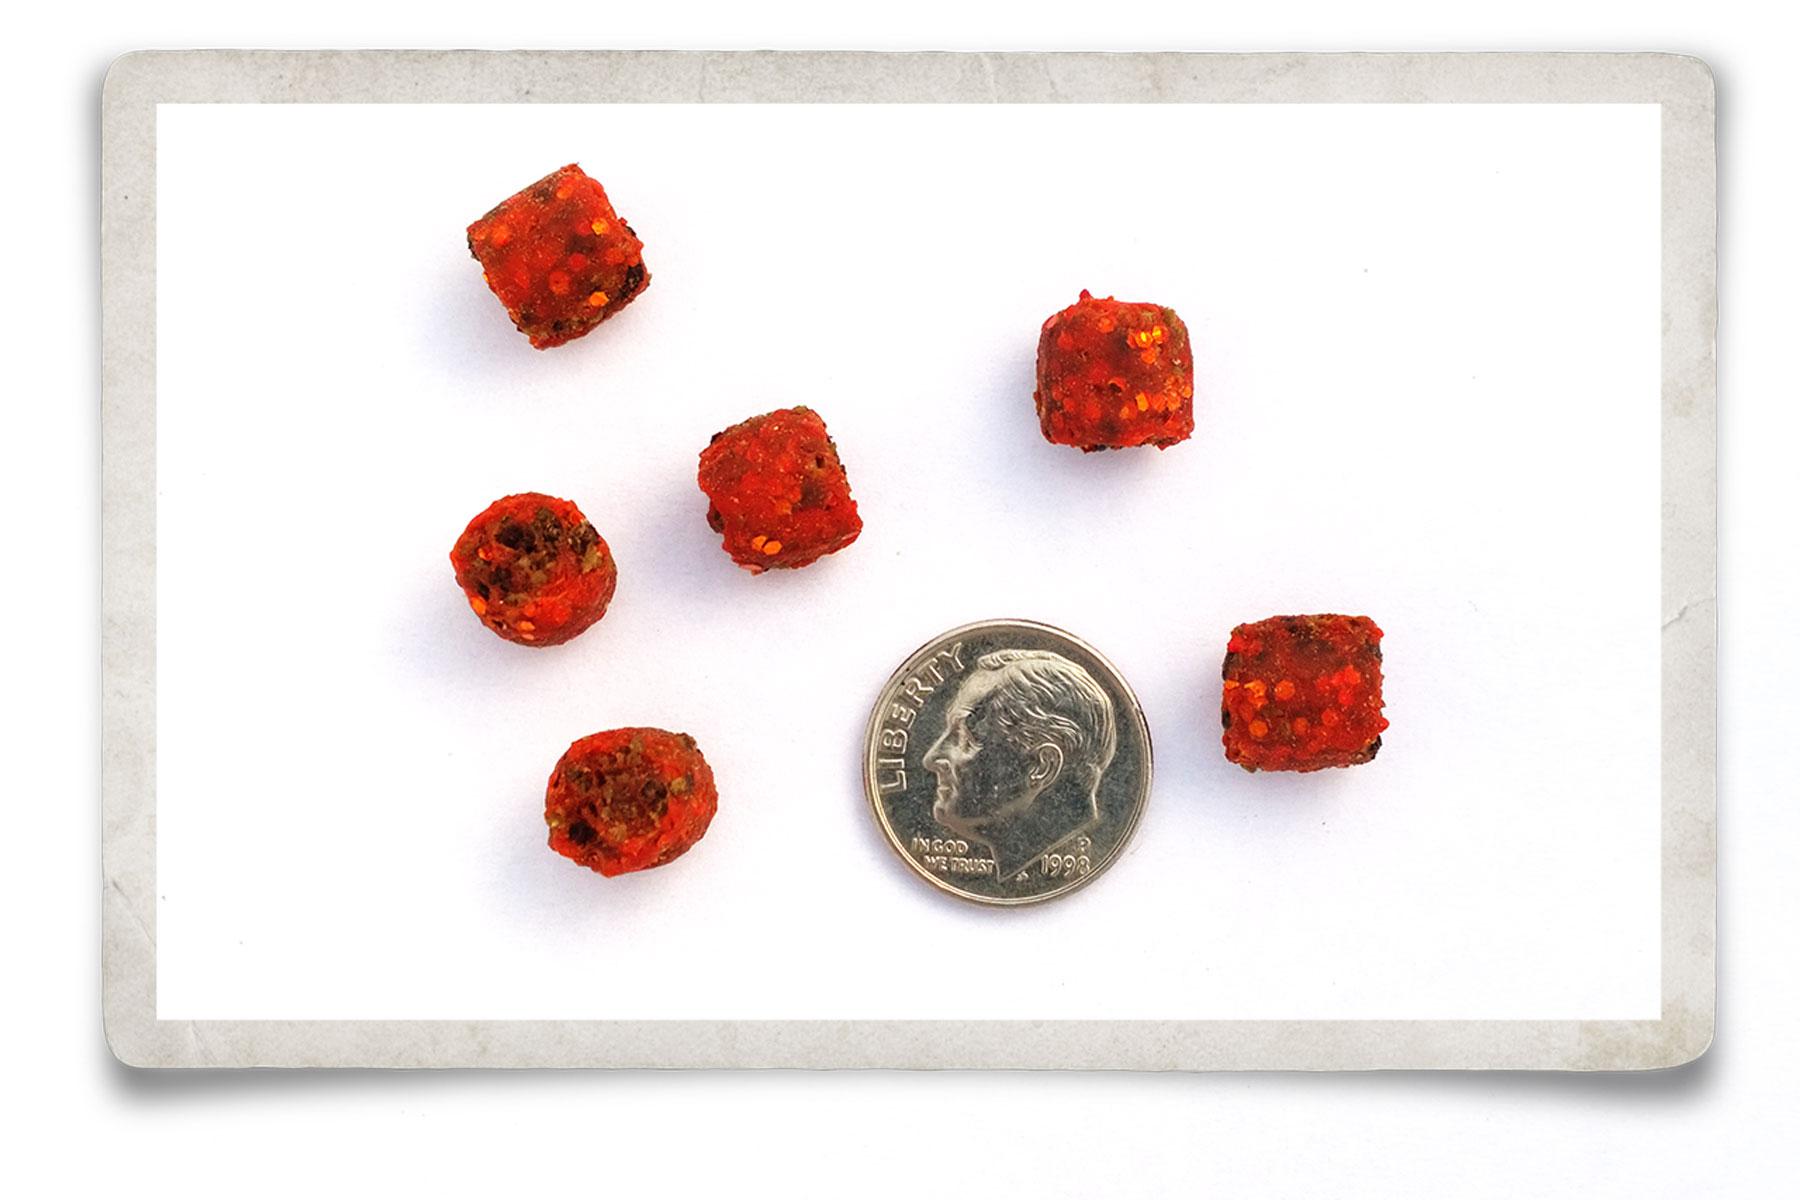 sparkle-orange-pellet-web.jpg